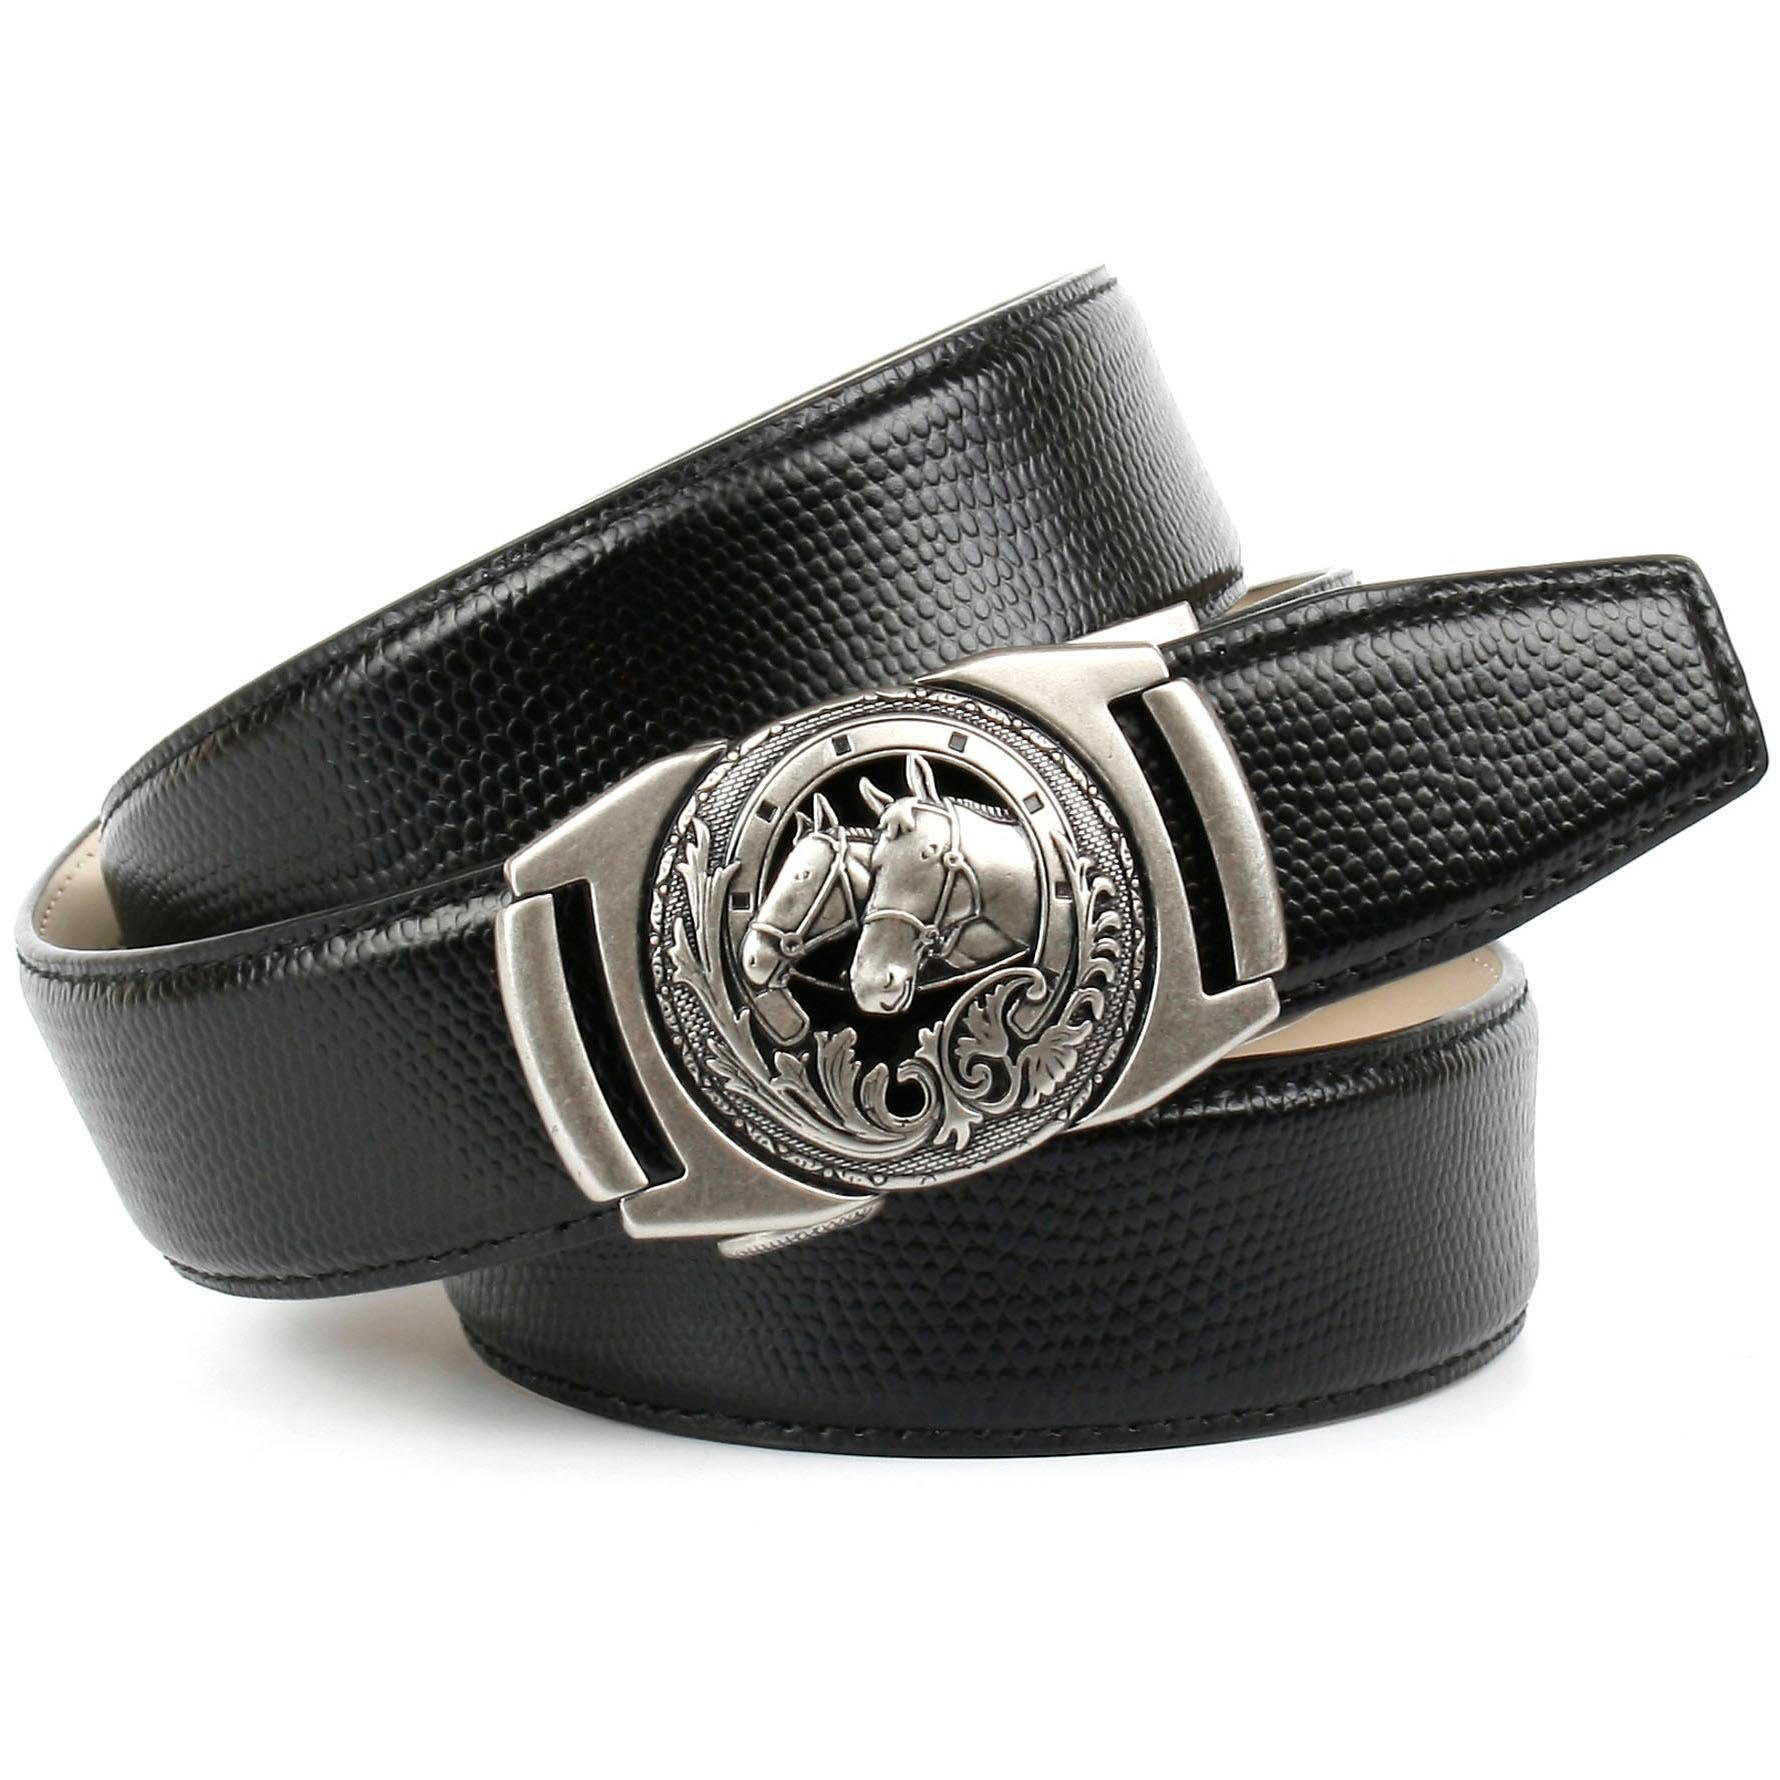 Anthoni Crown Ledergürtel, mit Metallschnalle Pferde-Emblem schwarz Damen Ledergürtel Gürtel Accessoires